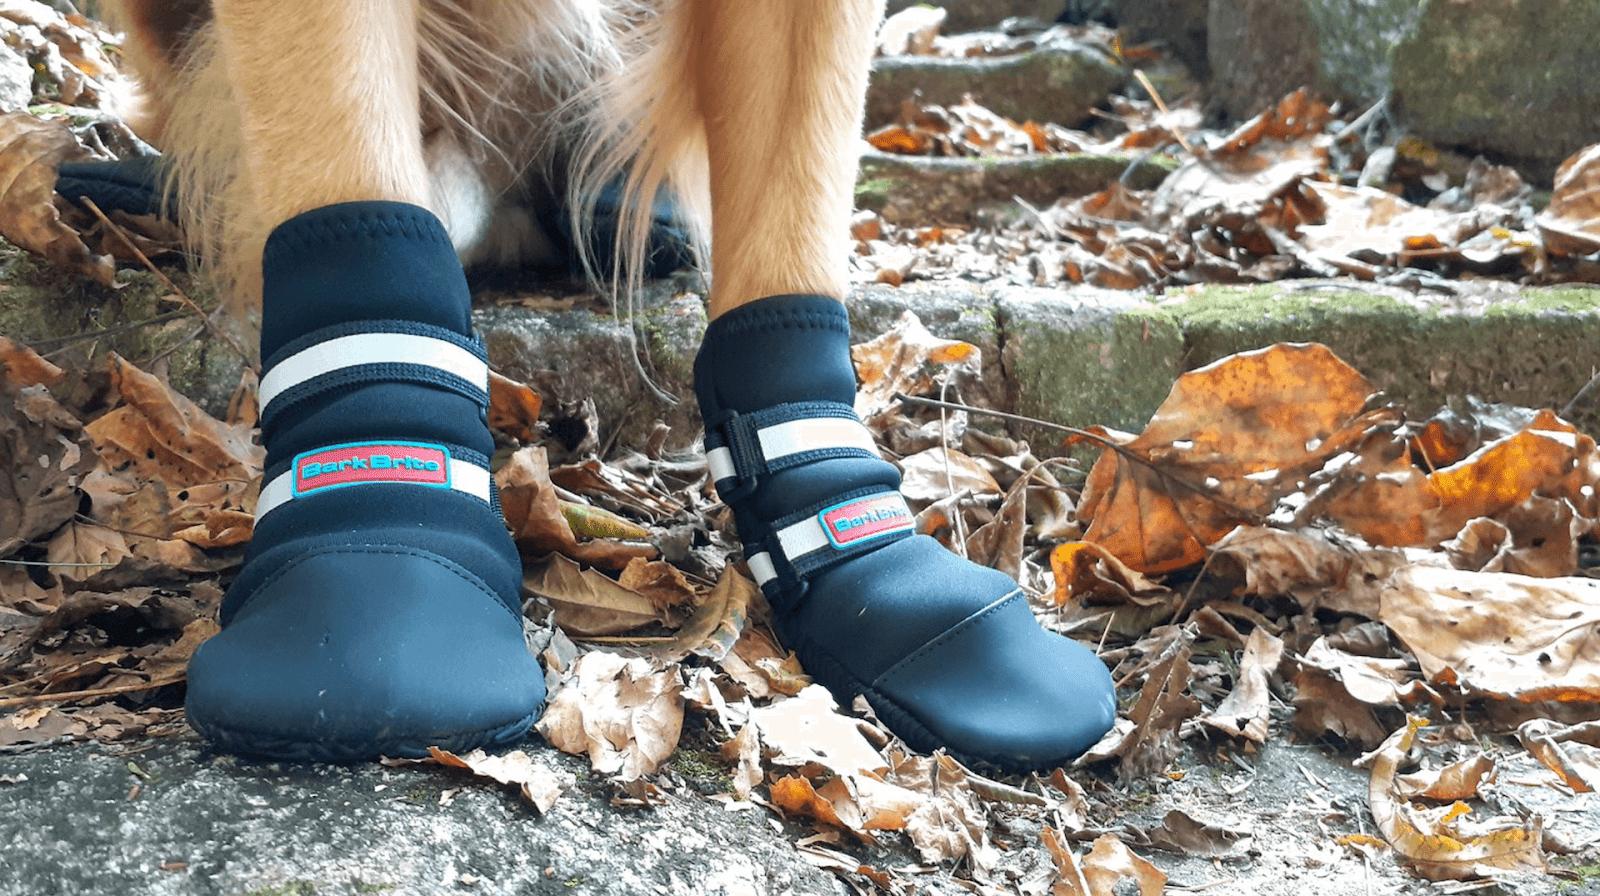 Bark Brite Neoprene Dog Boots